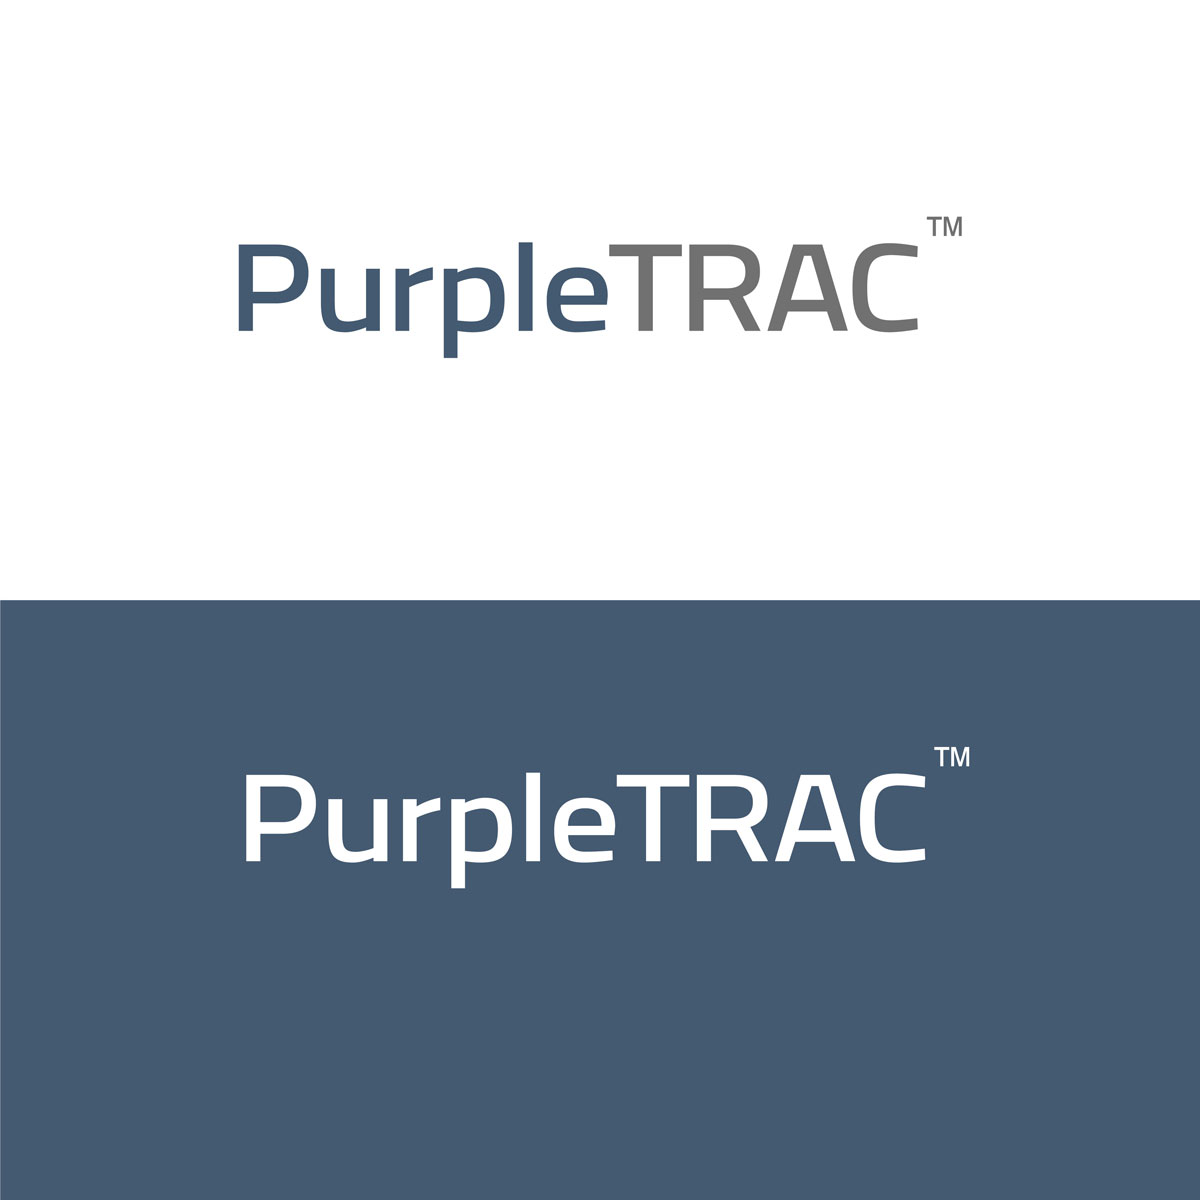 PurpleTRAC-logo